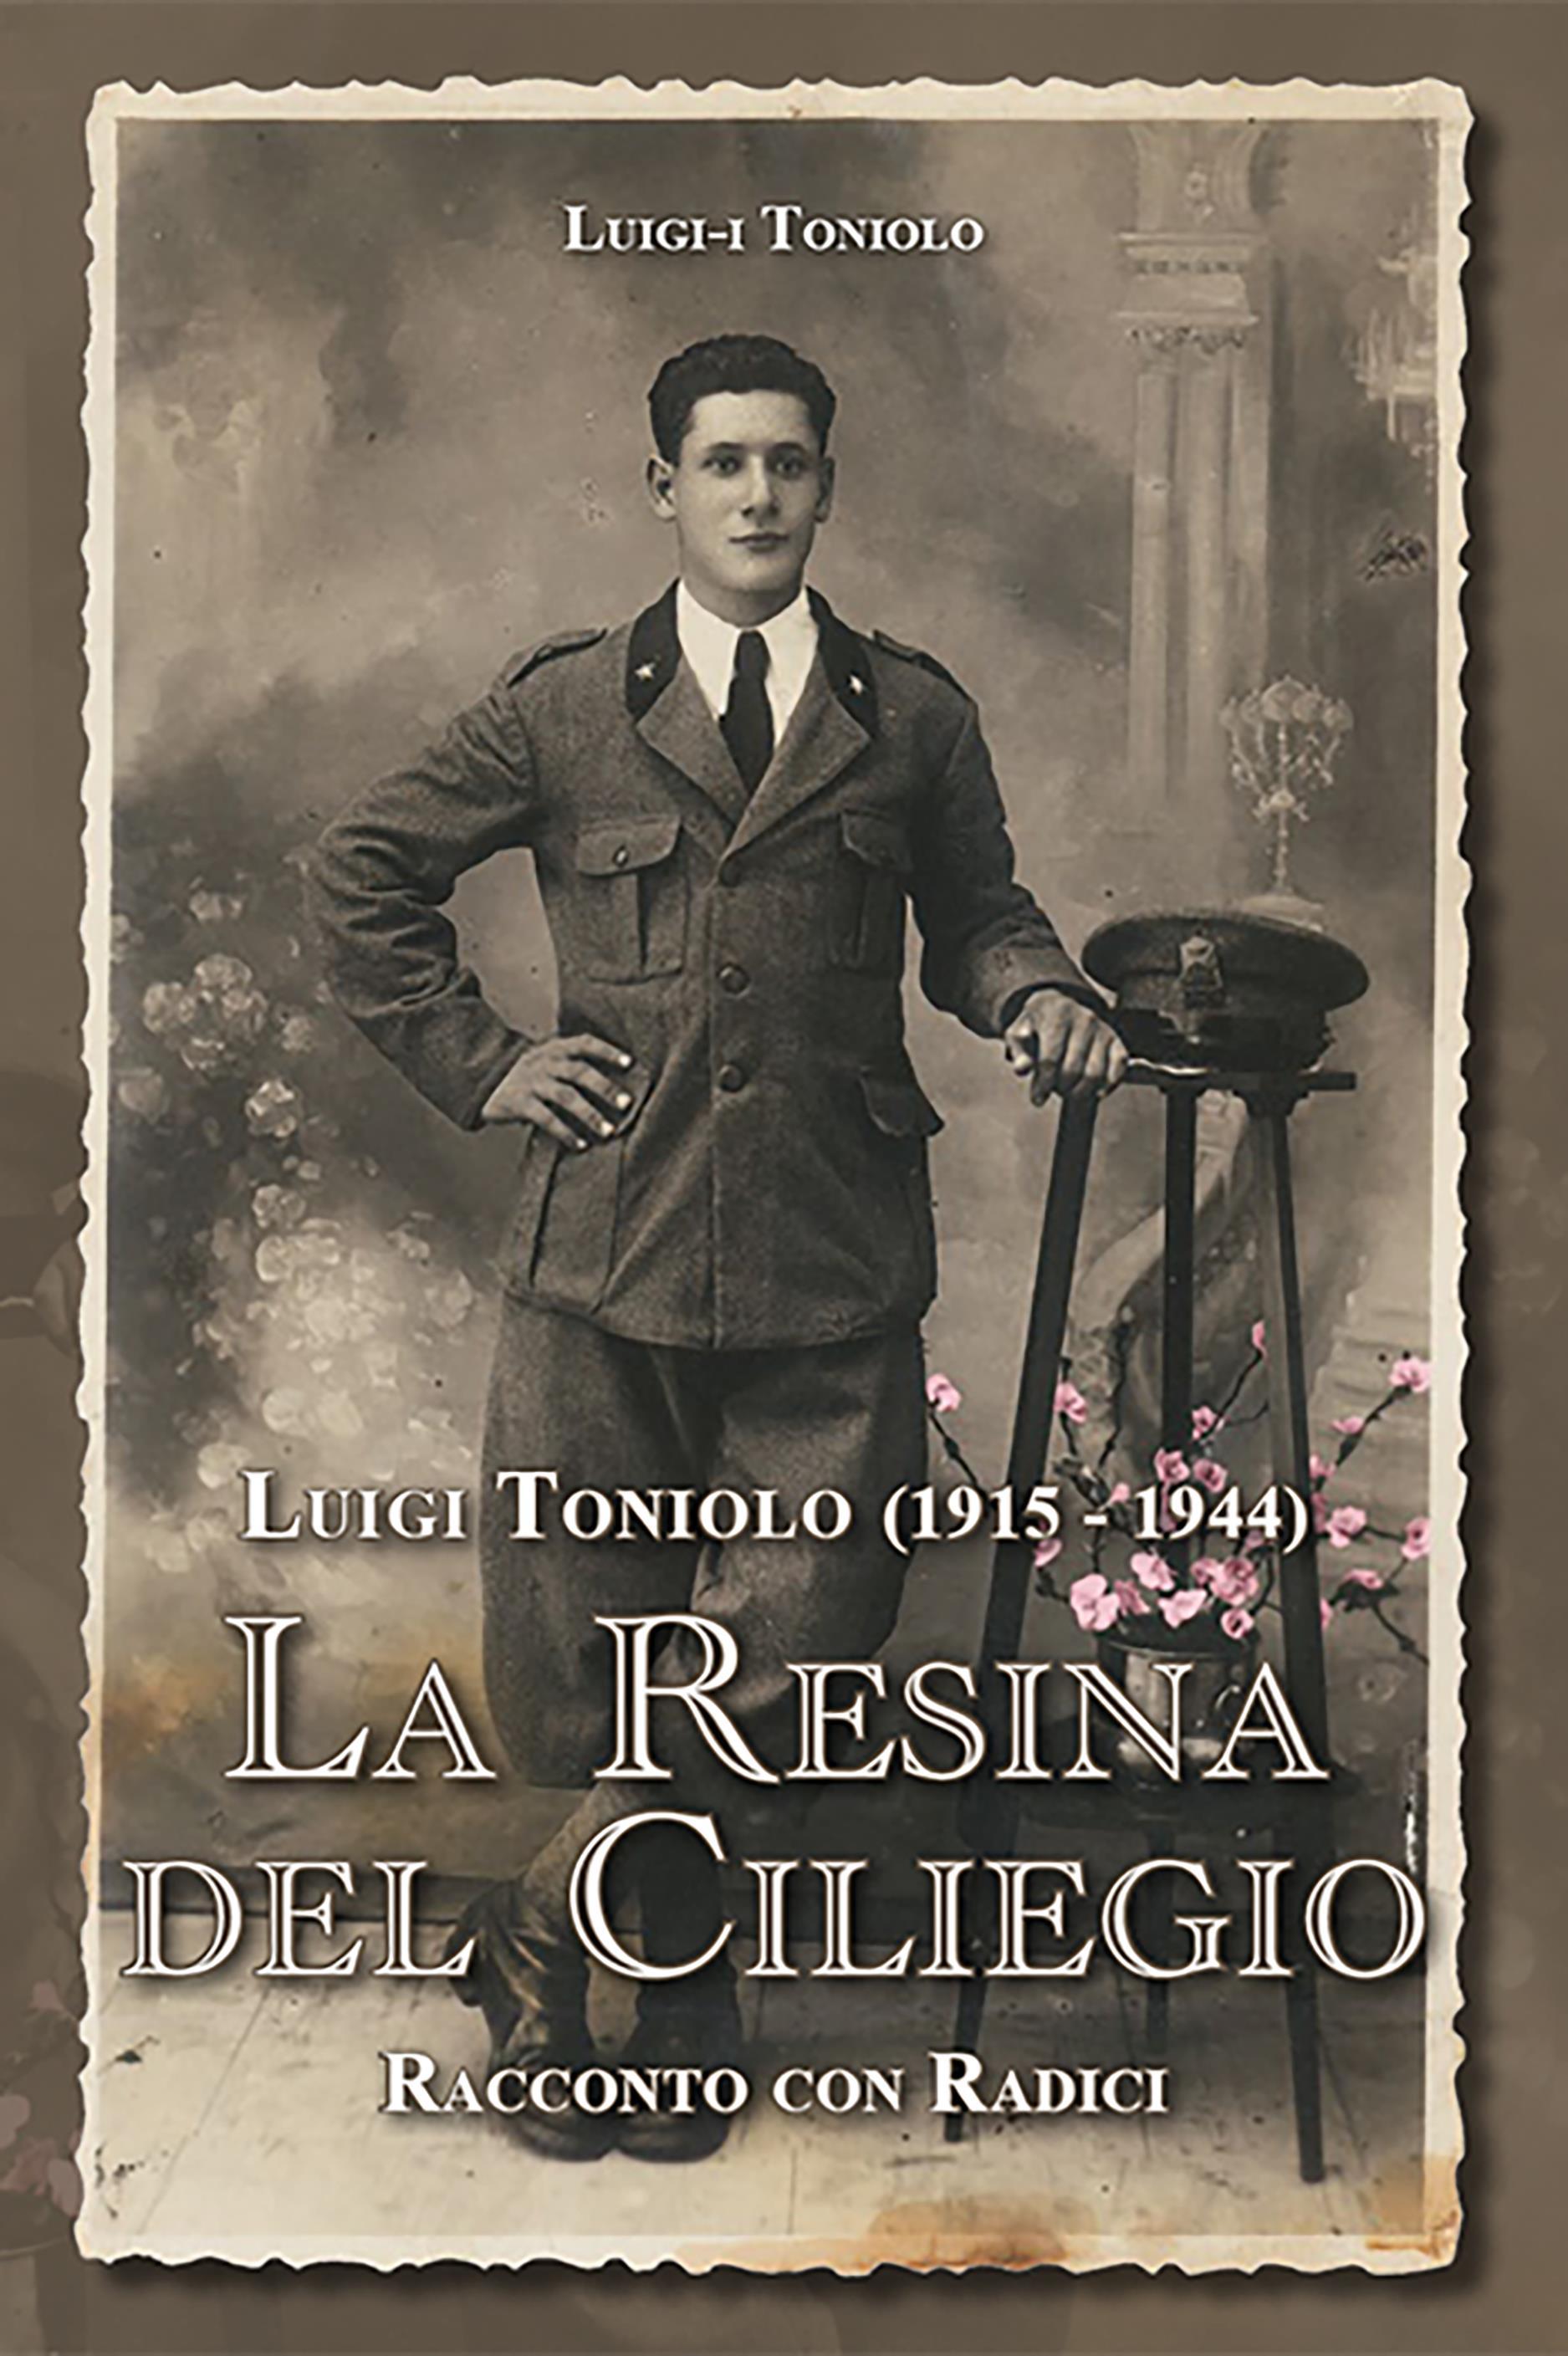 Luigi Toniolo (1915-1944). La resina del ciliegio